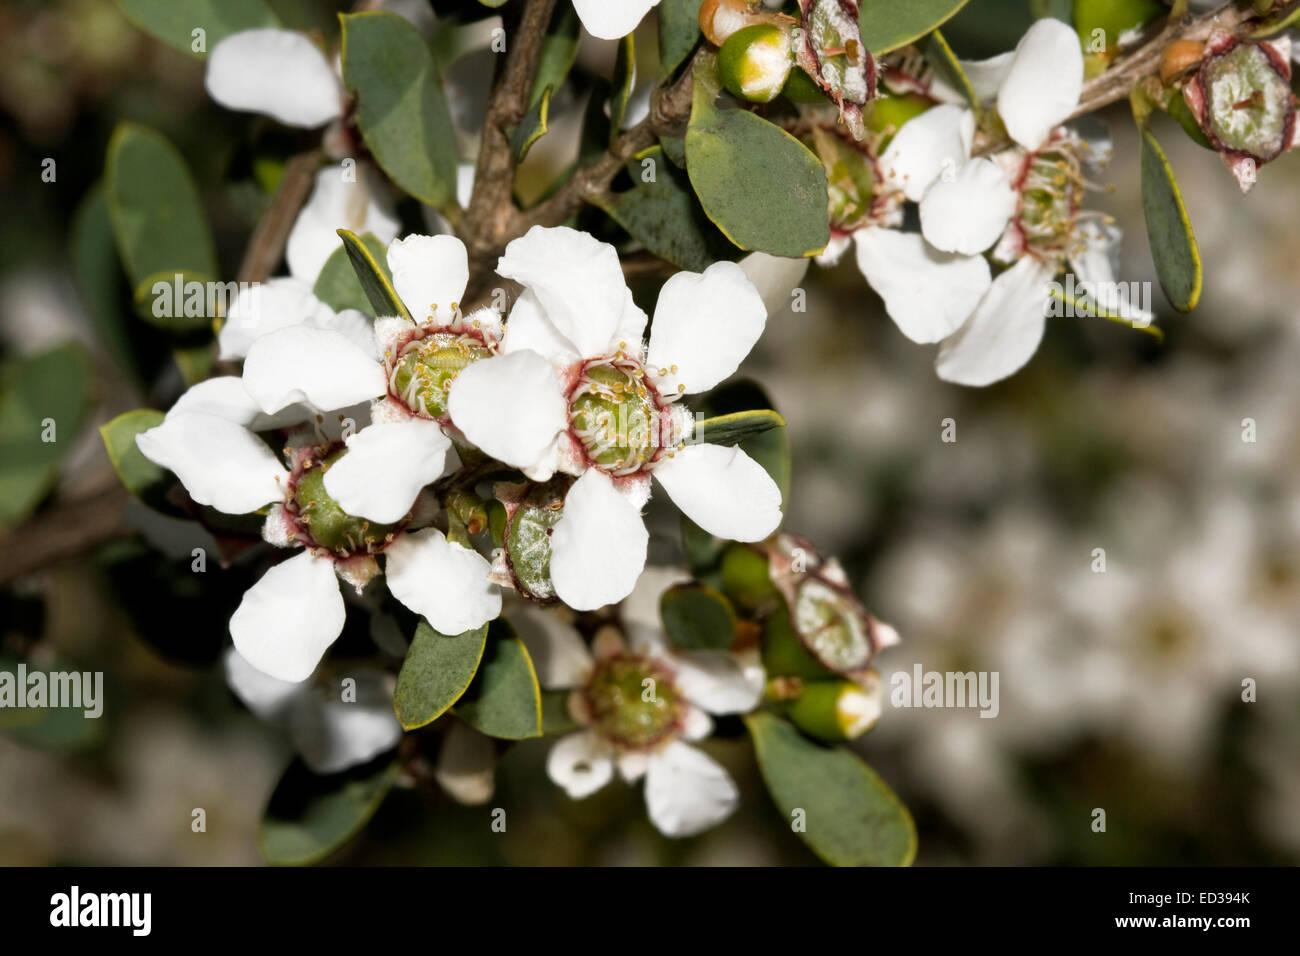 Coastal Flowering Plants Of Australia Stock Photos Coastal